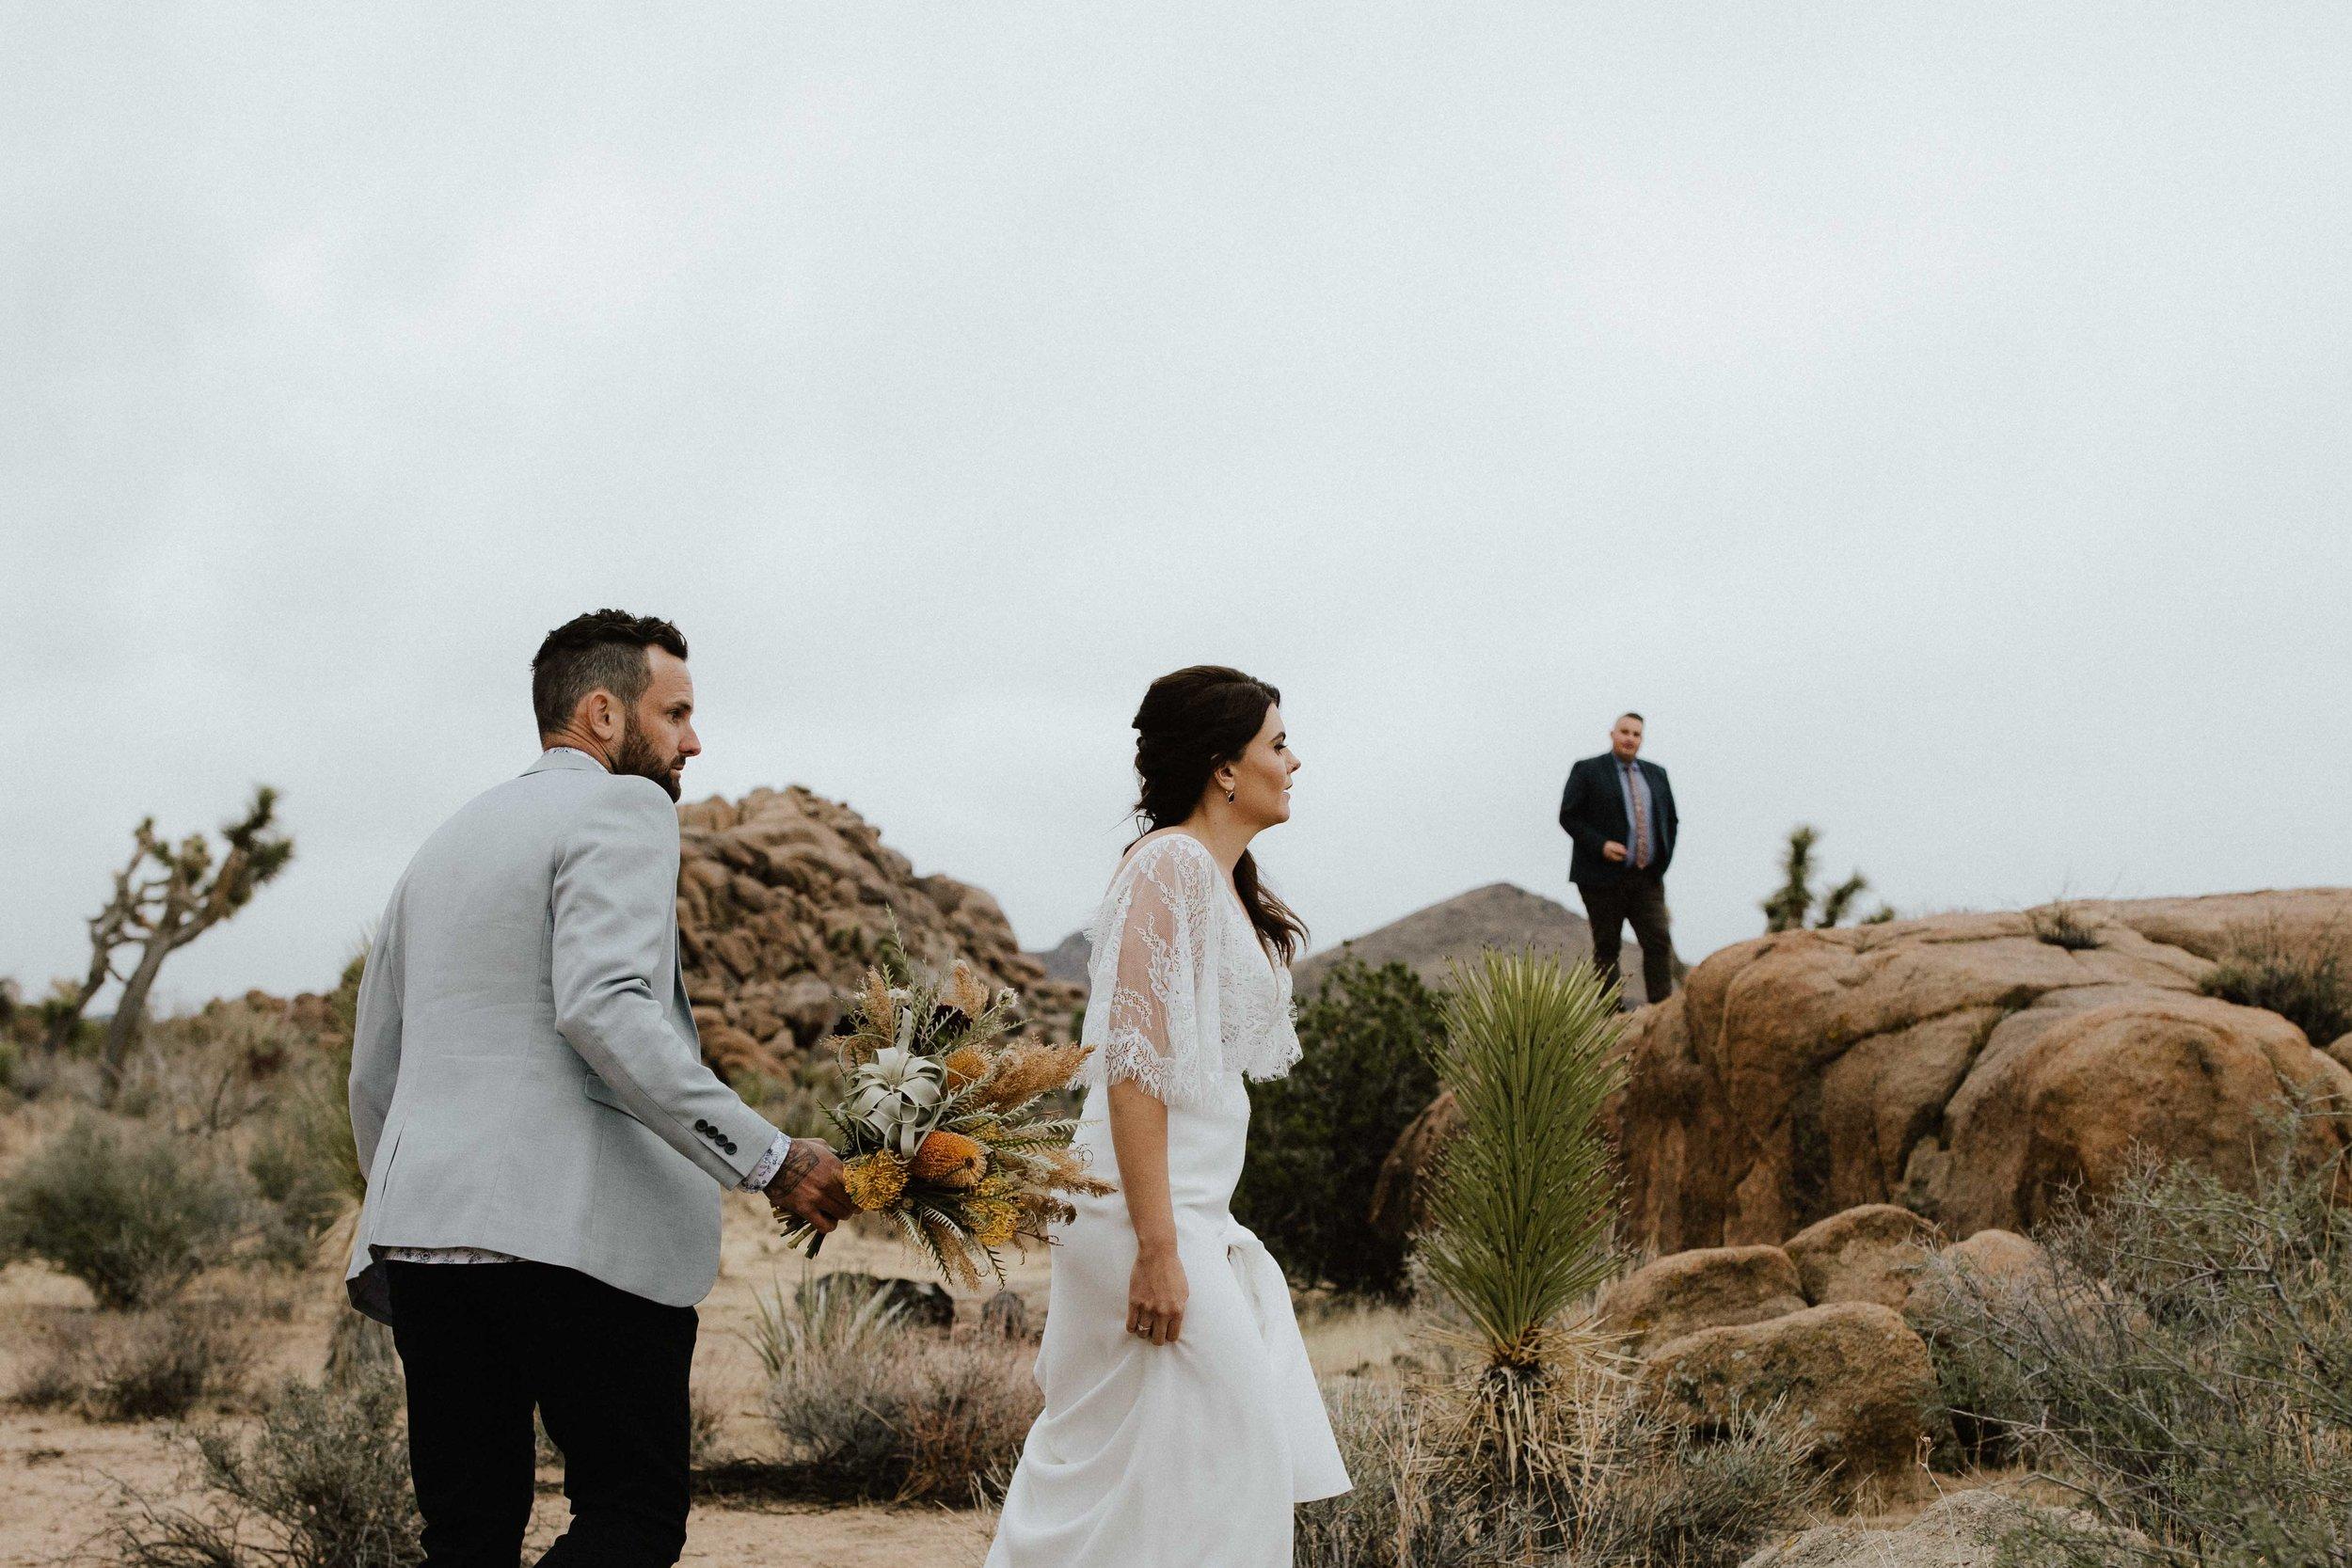 America Joshua Tree Palm Springs Elopement wedding-22.jpg